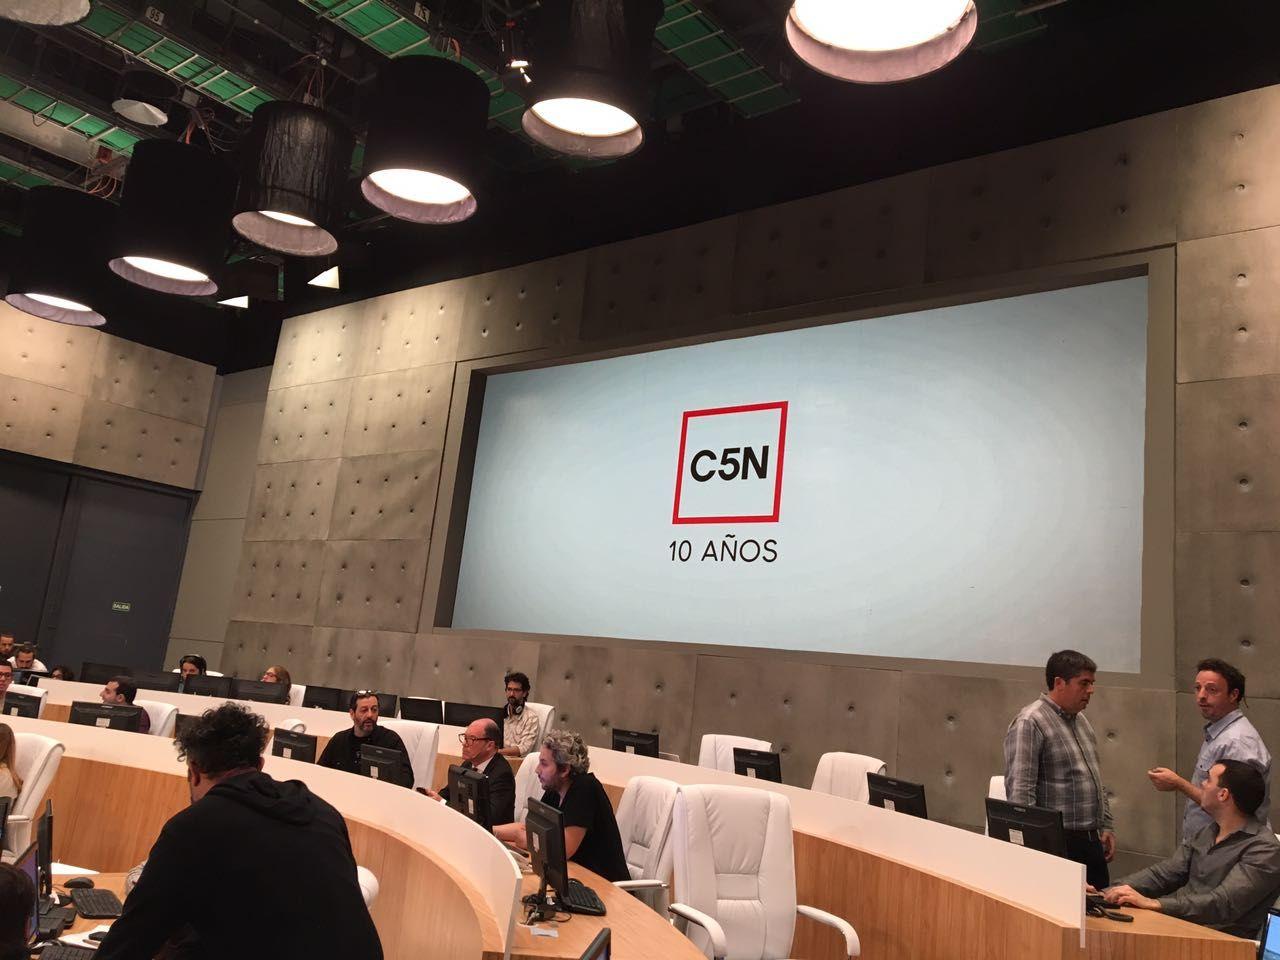 C5N cumplió 10 años